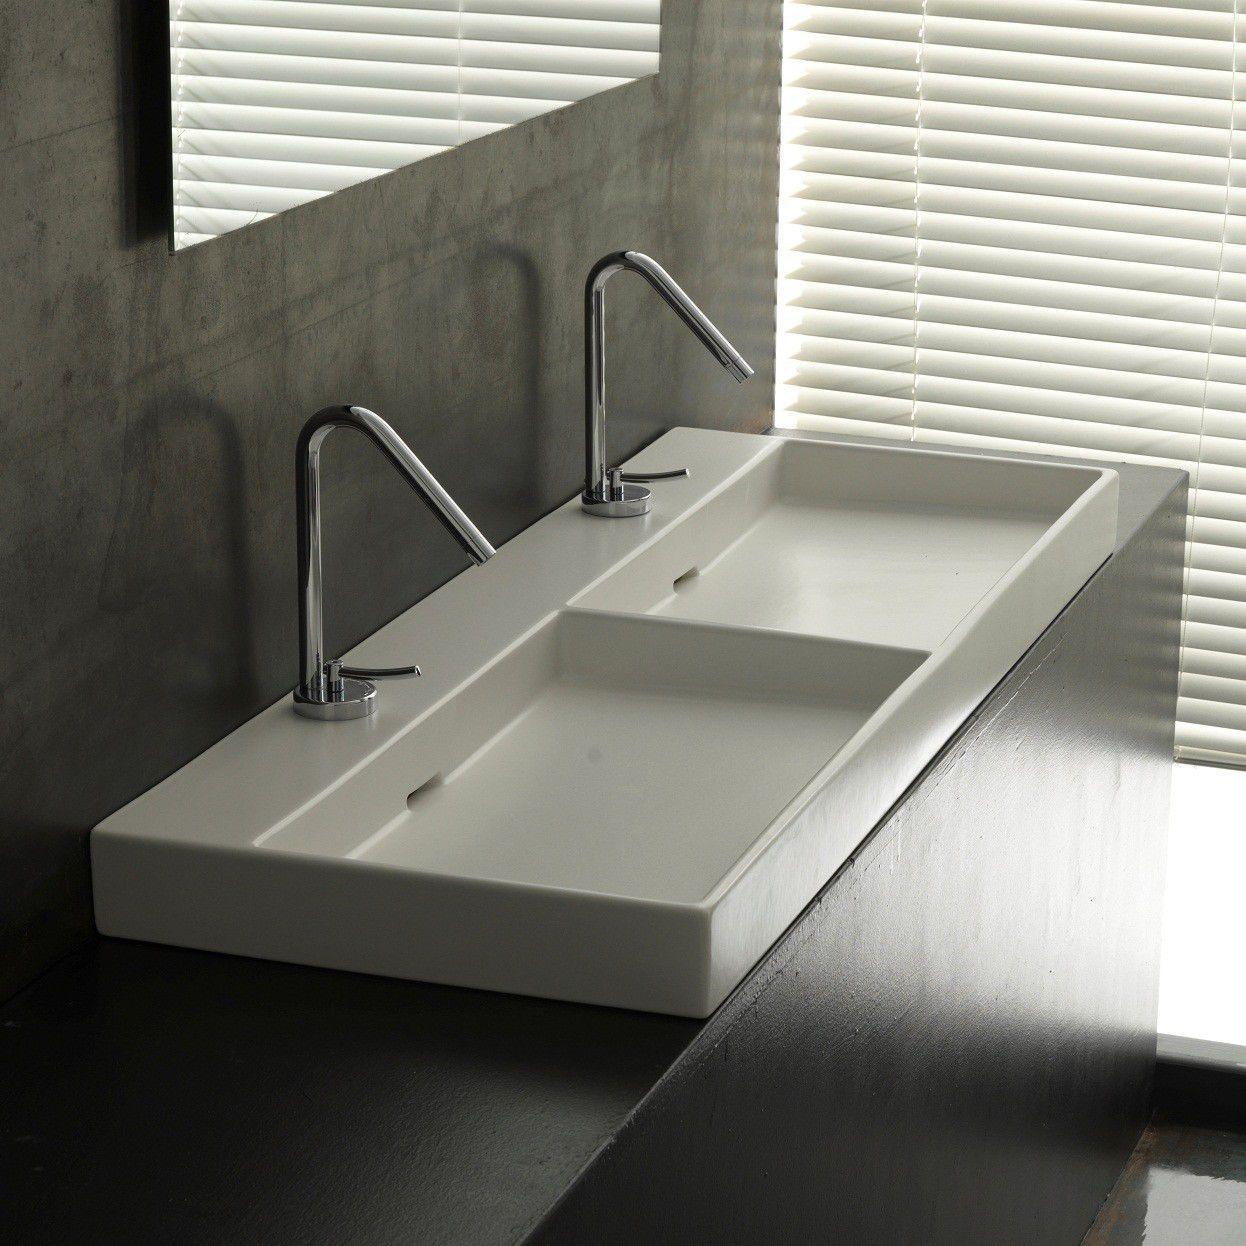 Lavabo Urban.Double Washbasin Countertop Rectangular Ceramic